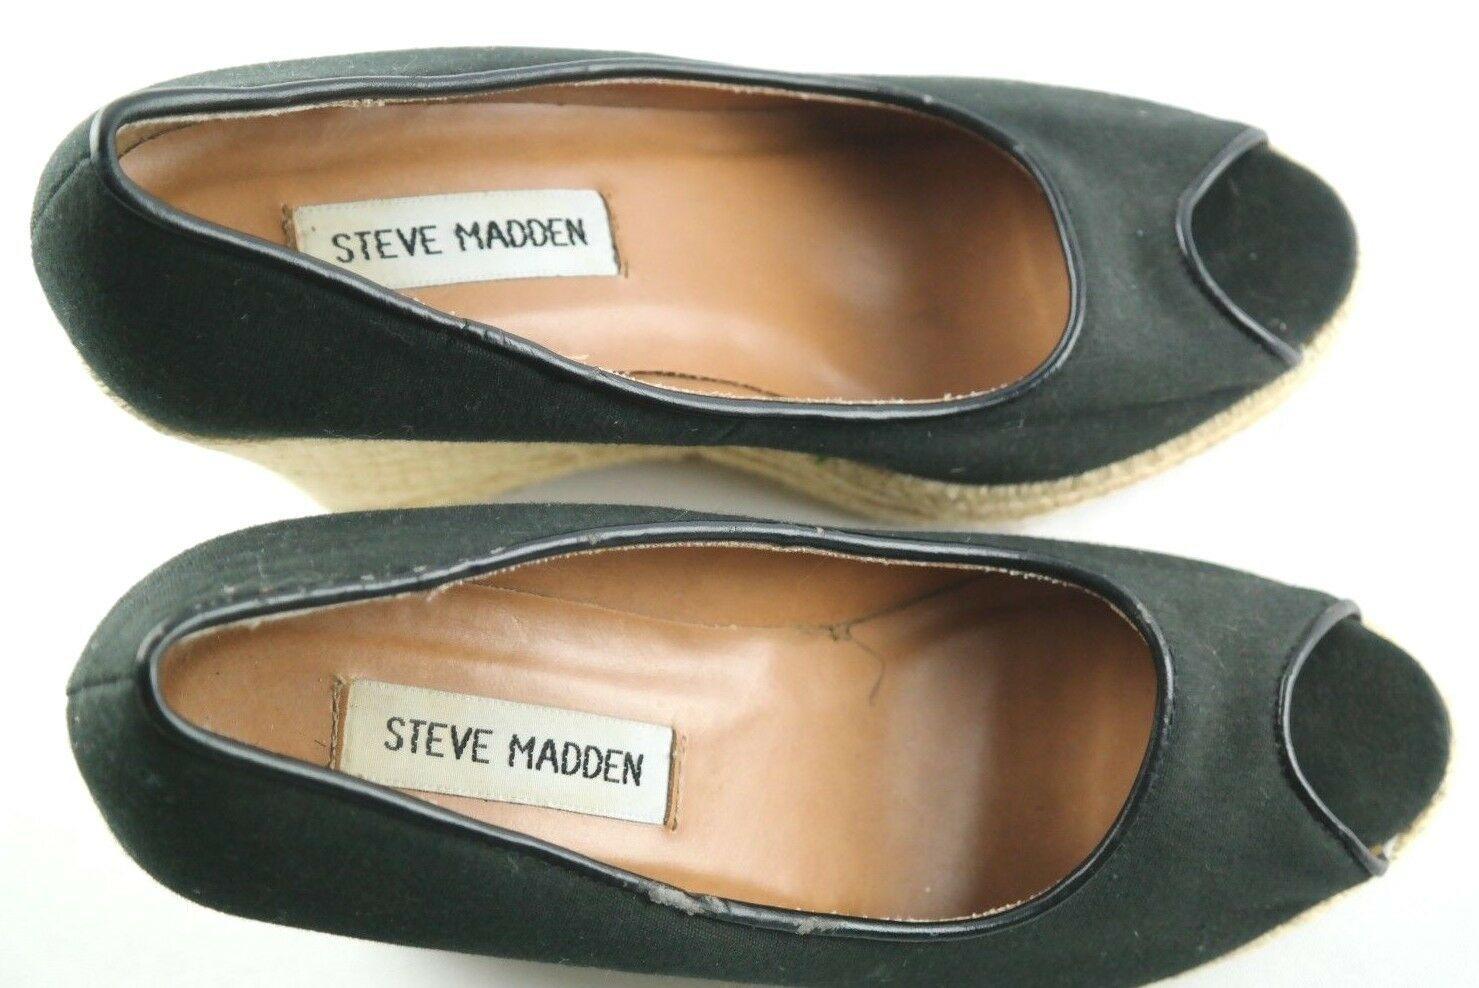 Steve Madden Peep Wedges Womens Size 6 Black Canvas Slip On High Heel Shoes image 6